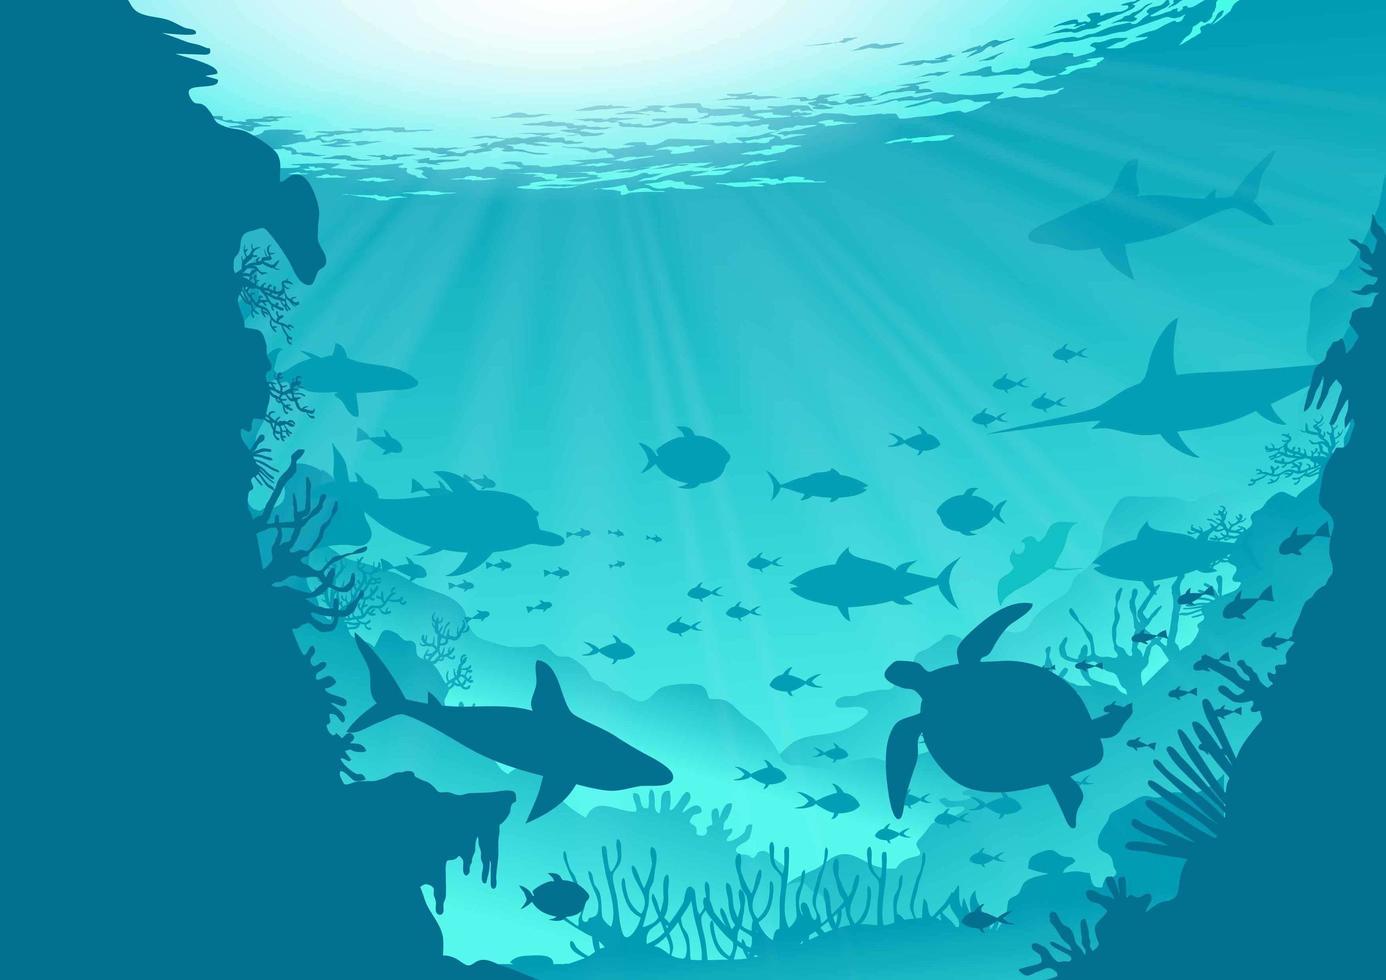 Fond de l'océan profond